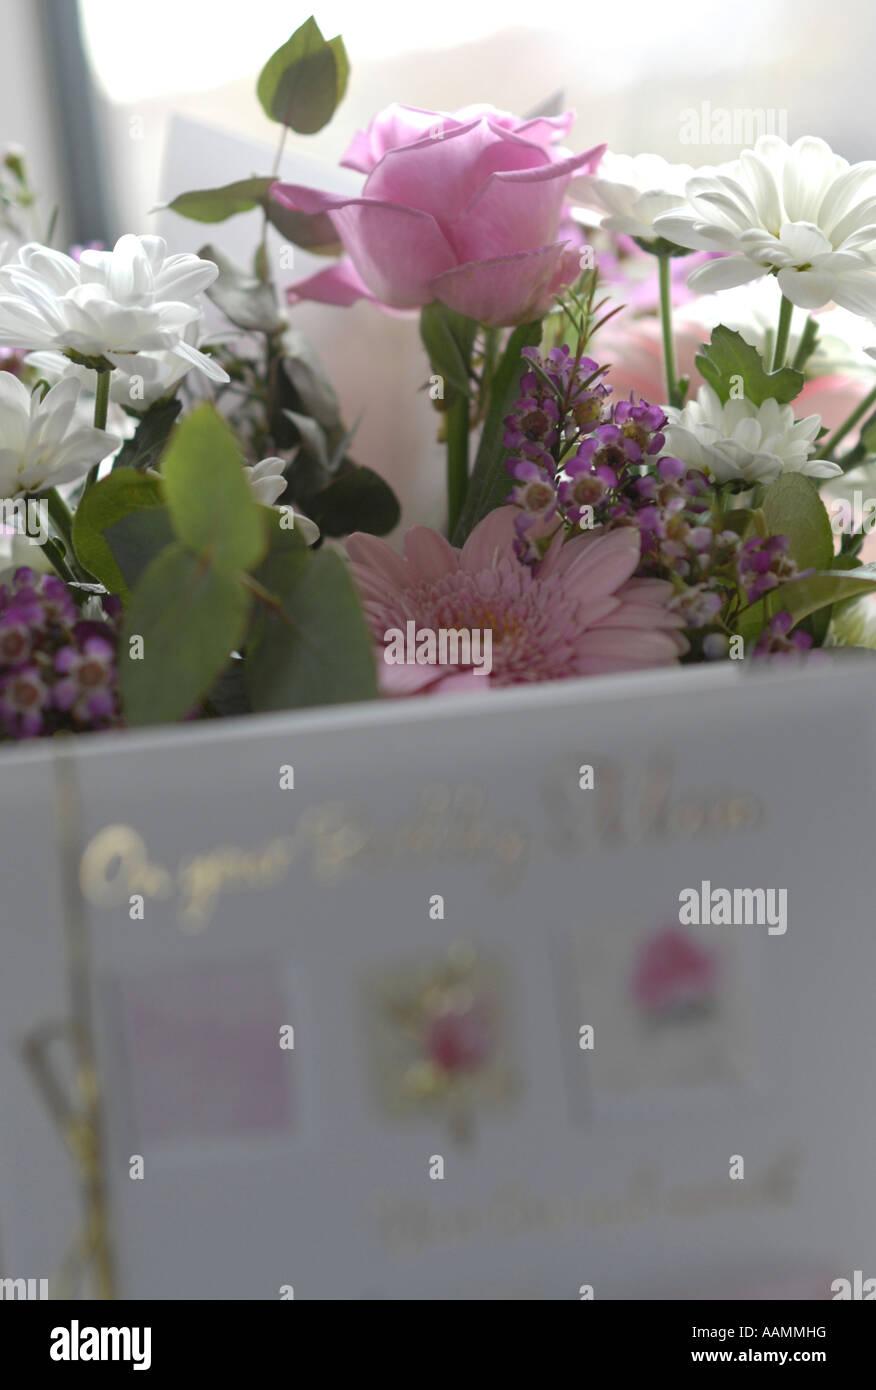 Birthday Card And Flowers To Mum Stock Photo 12663819 Alamy